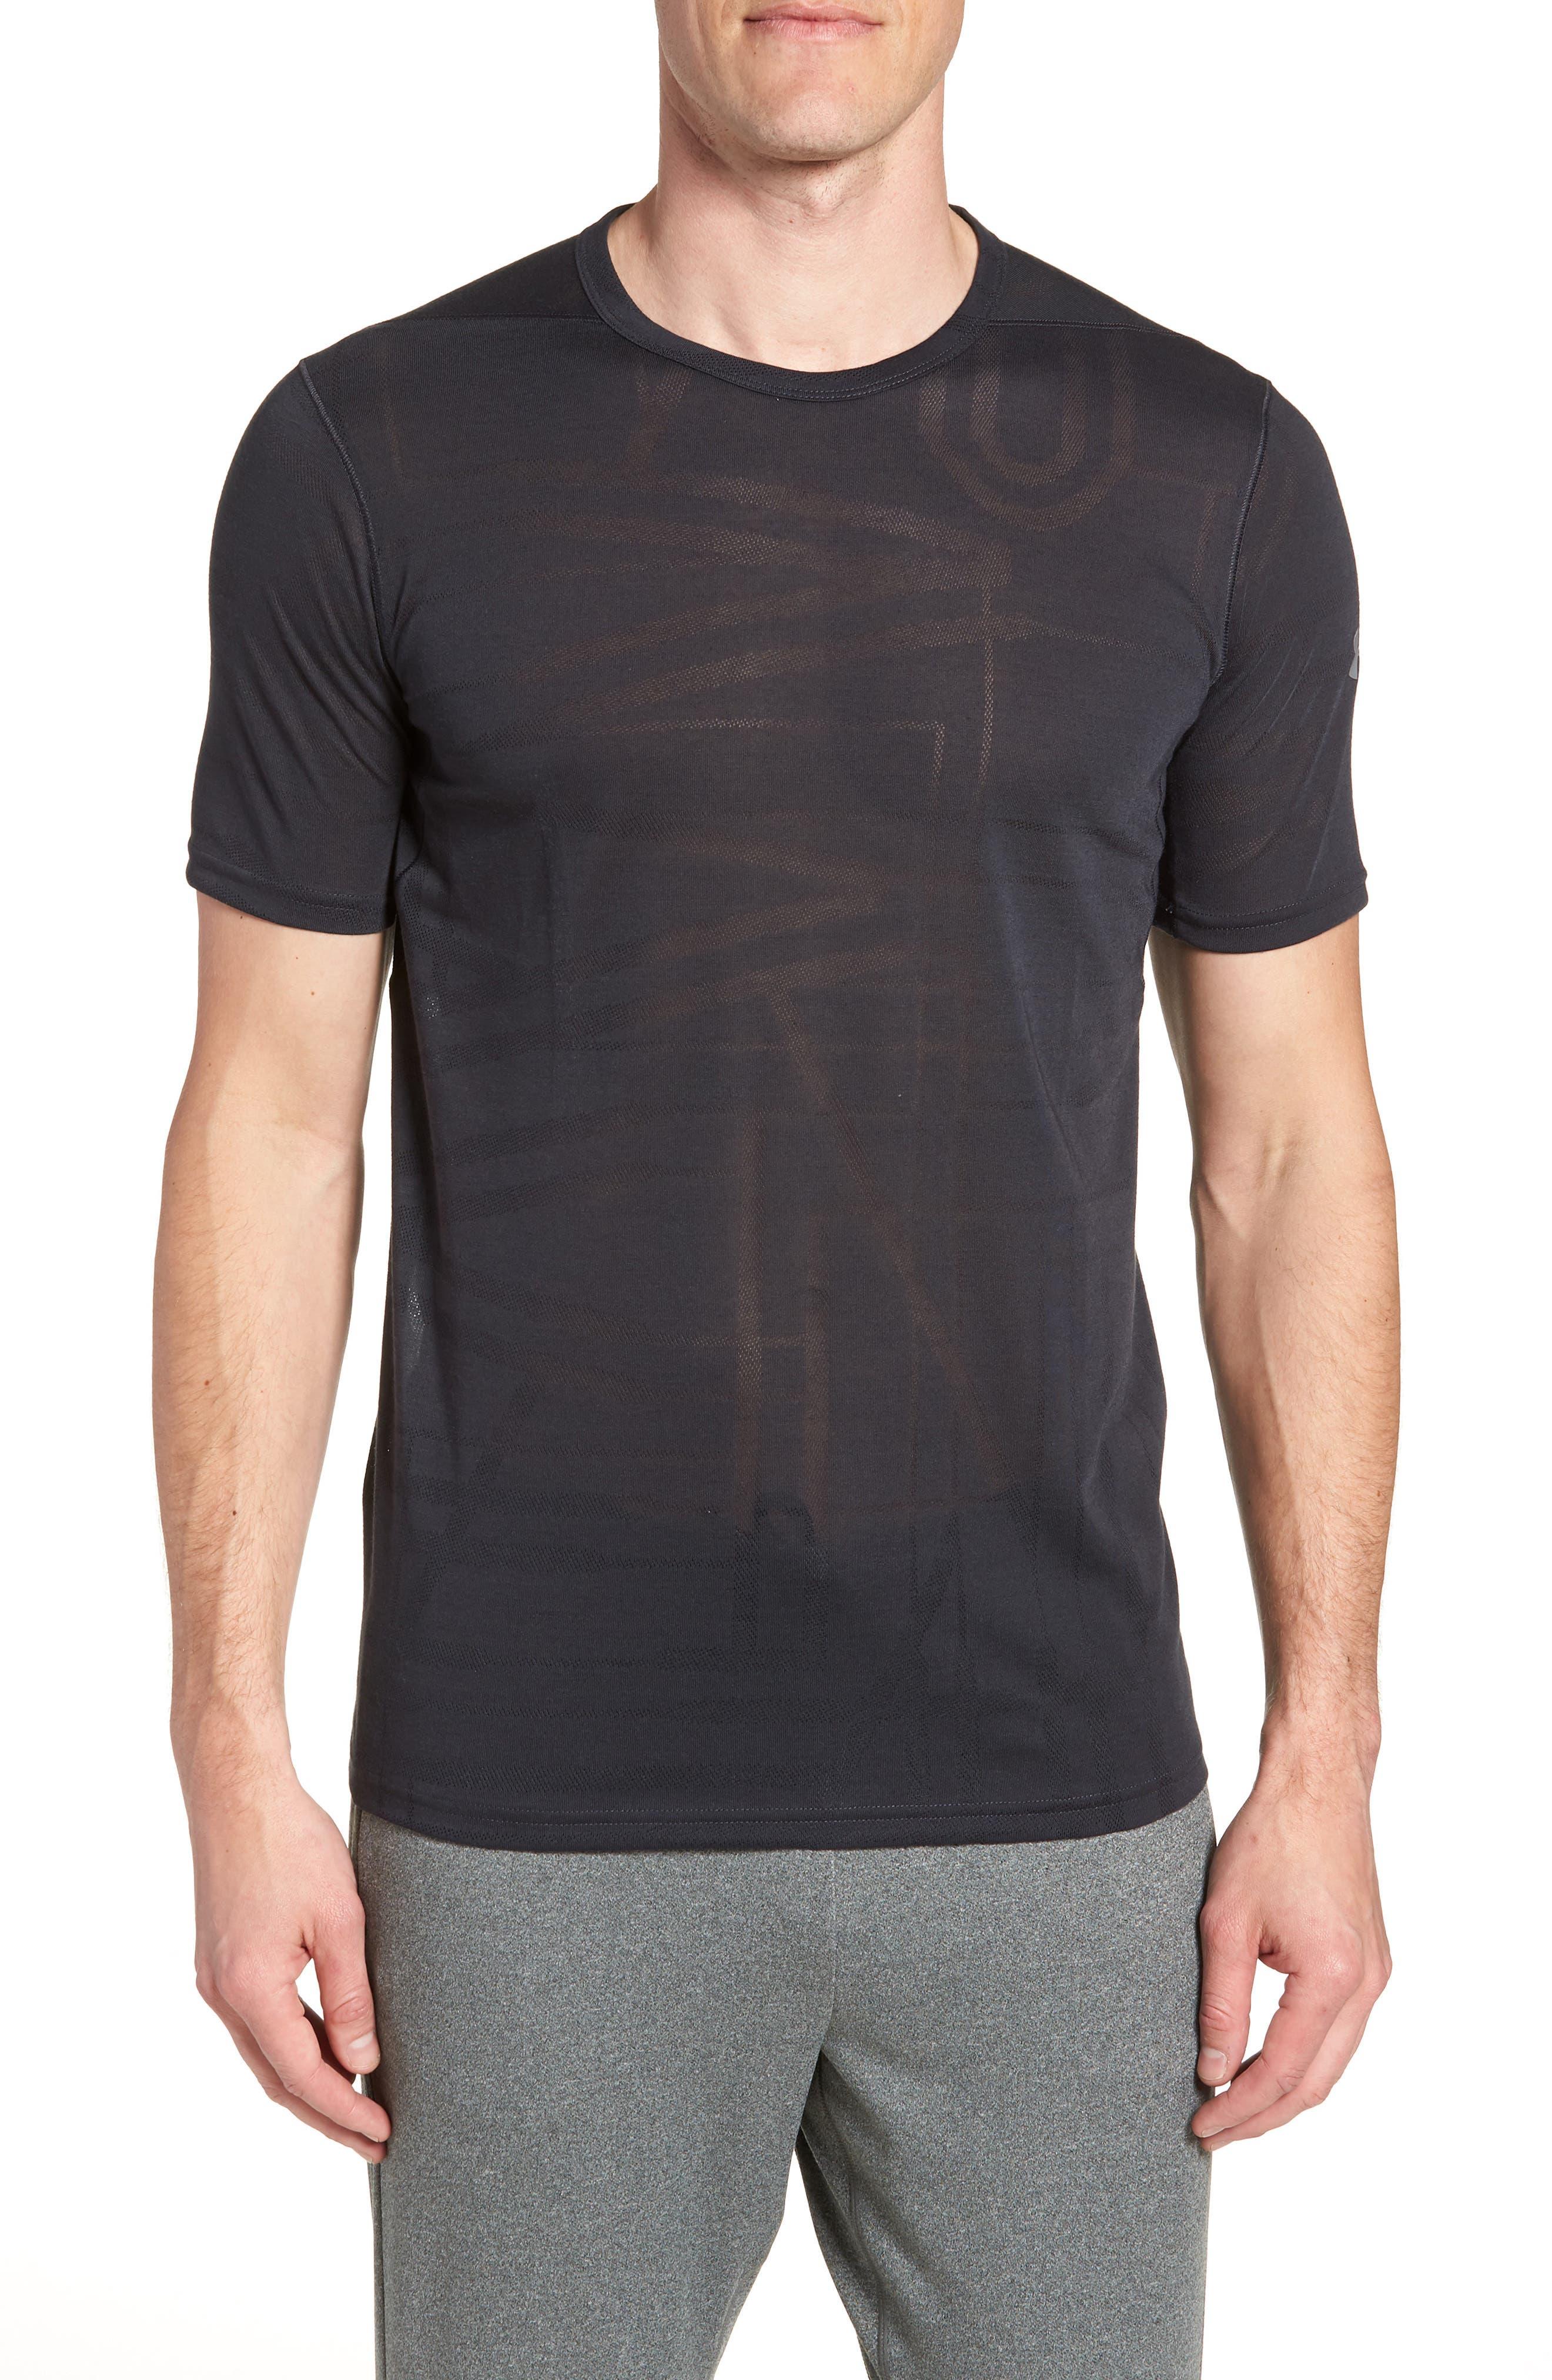 Threadborne Elite Crewneck T-Shirt,                             Main thumbnail 1, color,                             Black/ Graphite